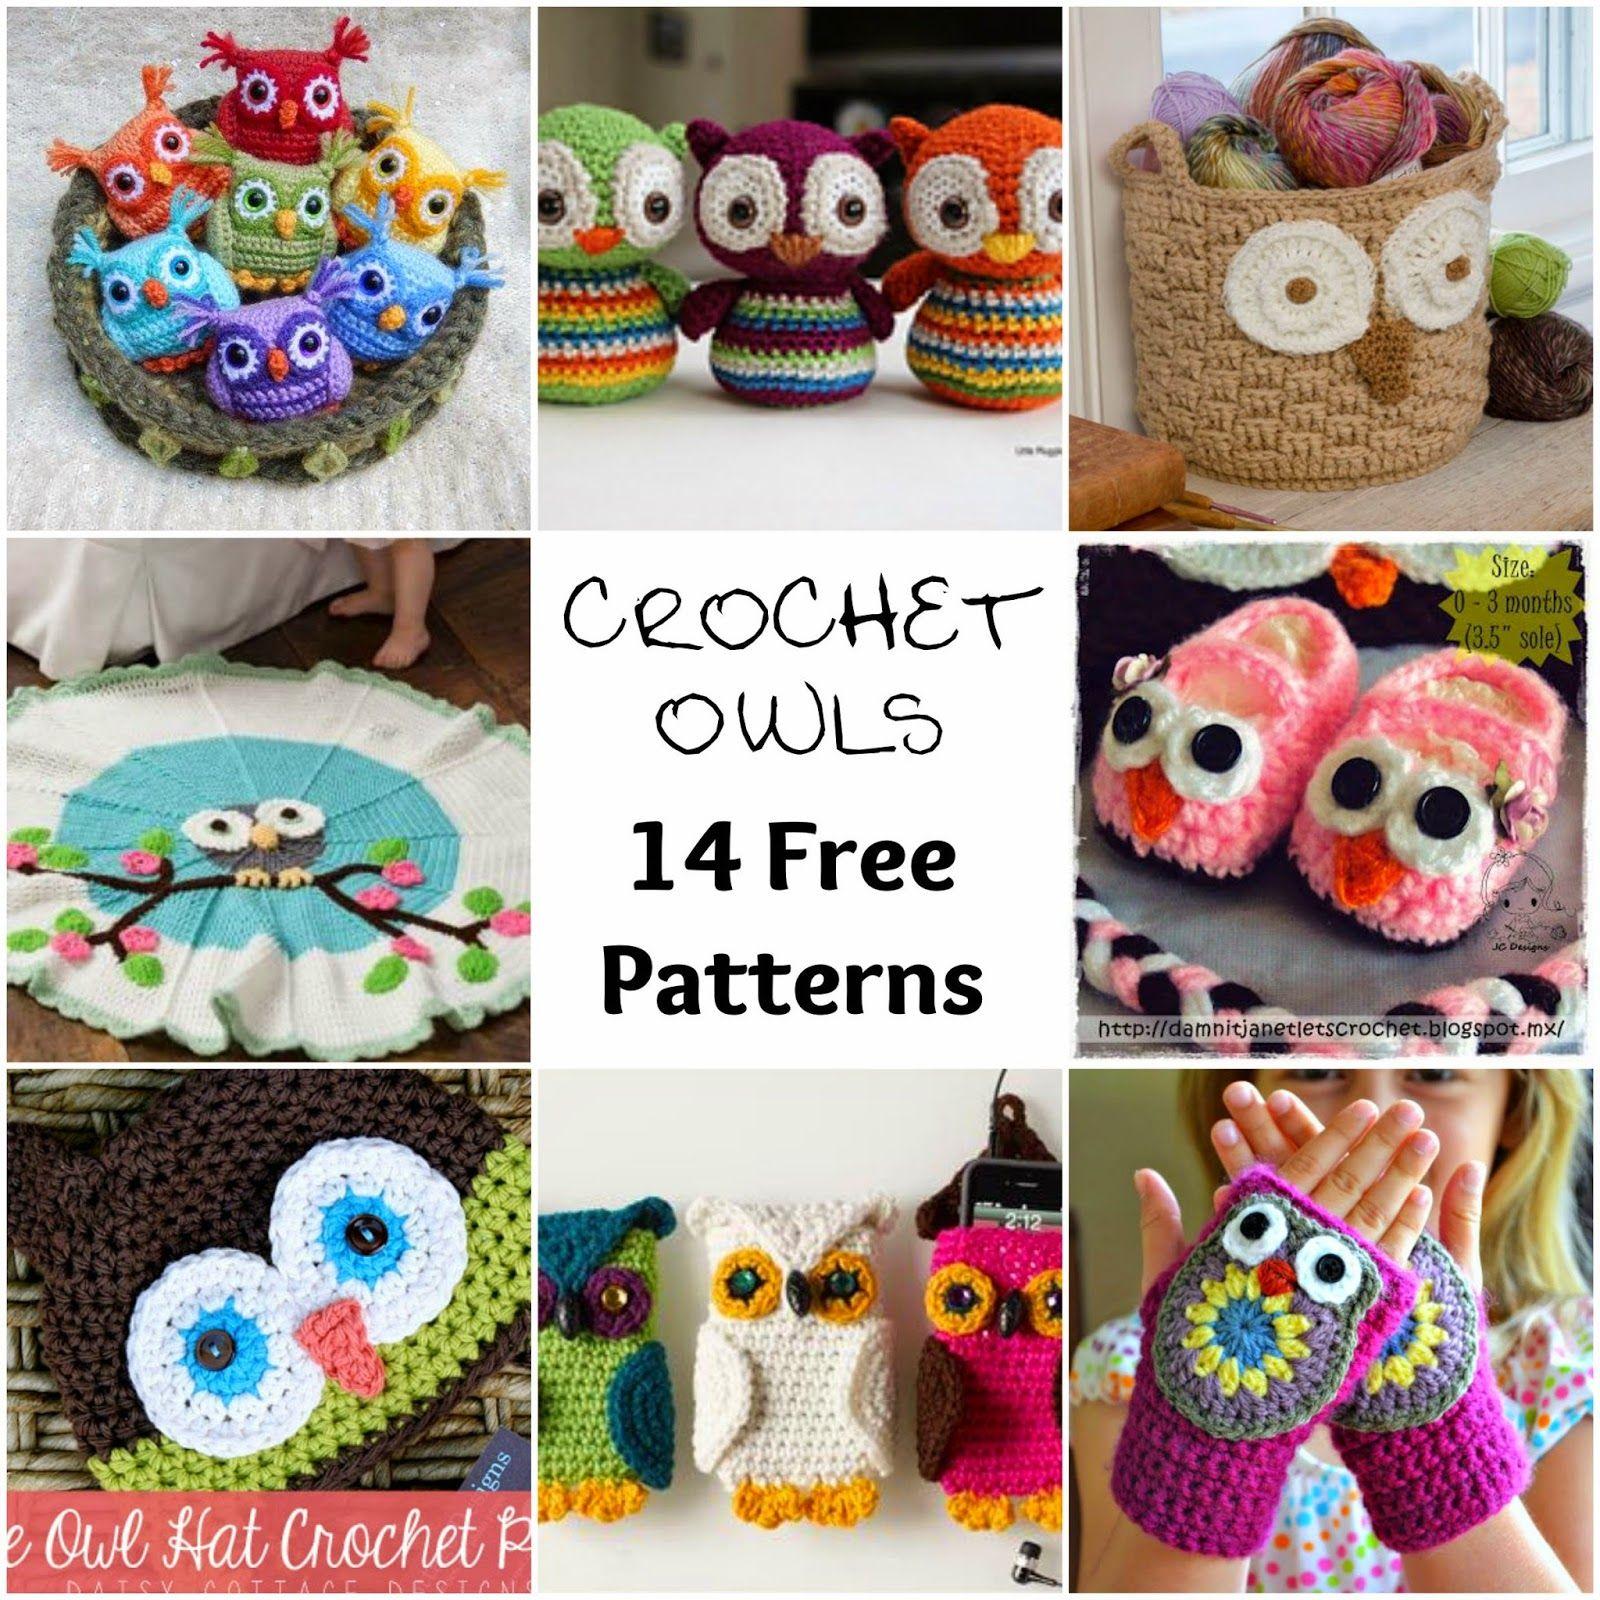 Free Crochet Pattern Round-Up - Owls - Free Crochet Pattern | buhos ...